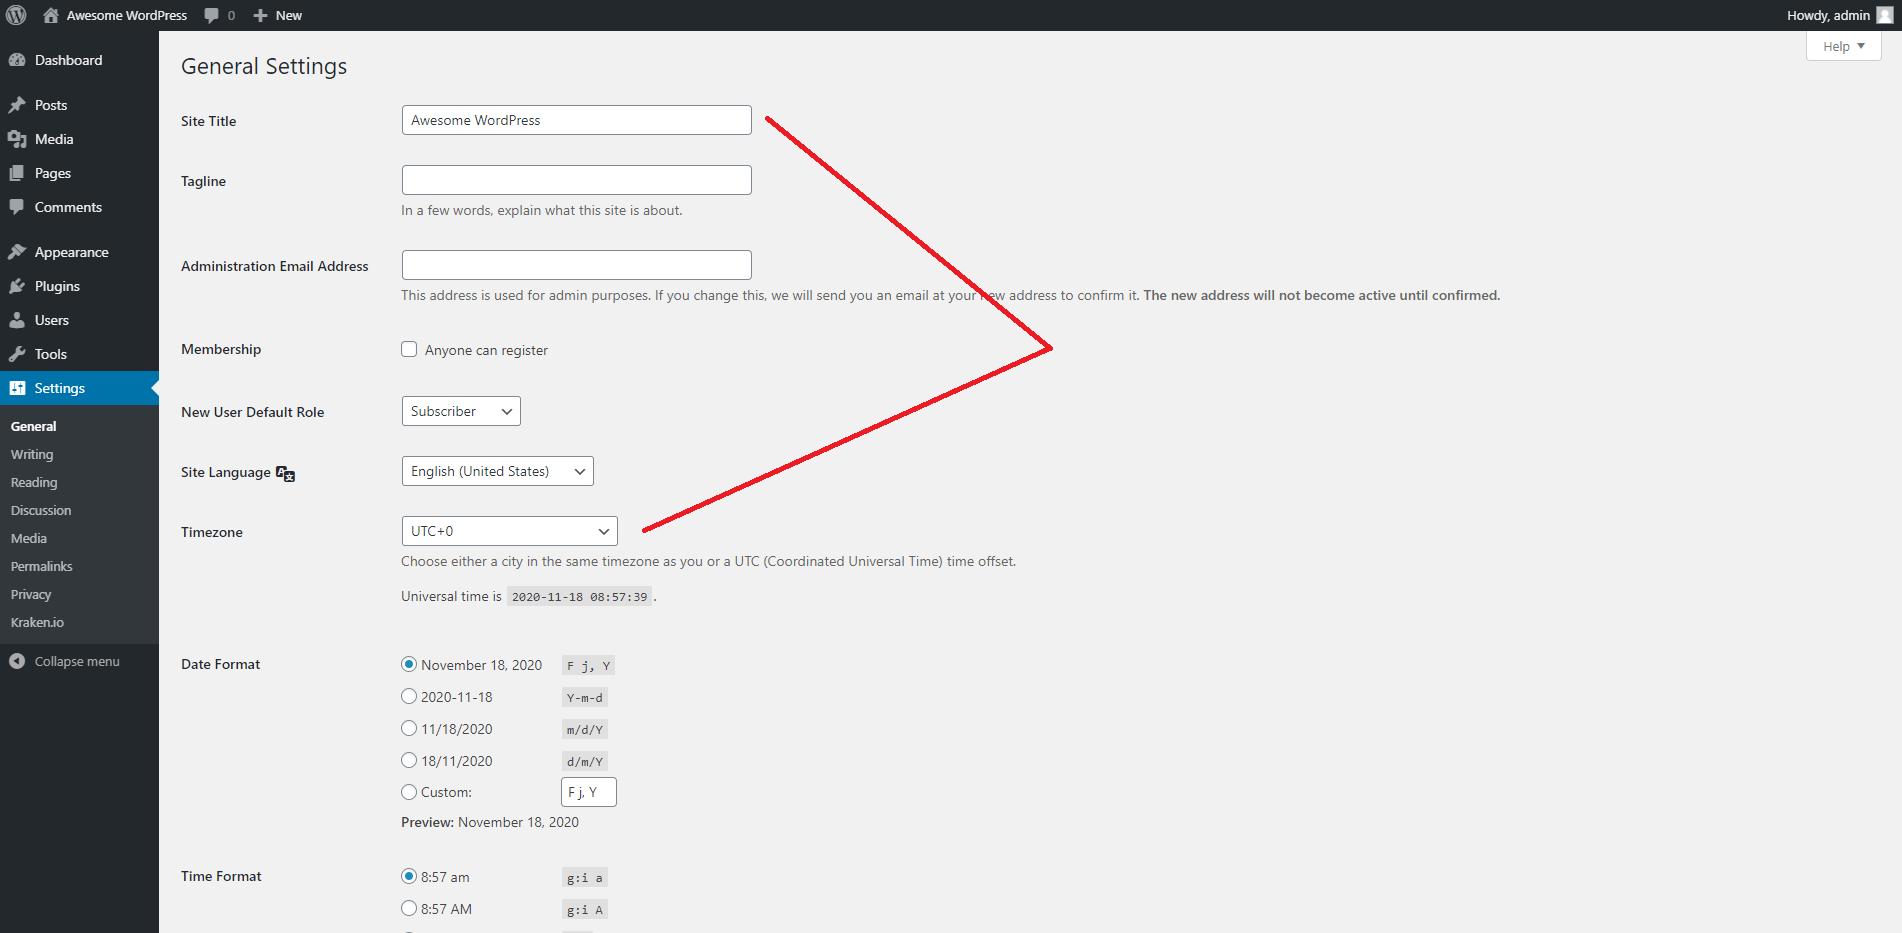 WordPress Dashboard General Settings